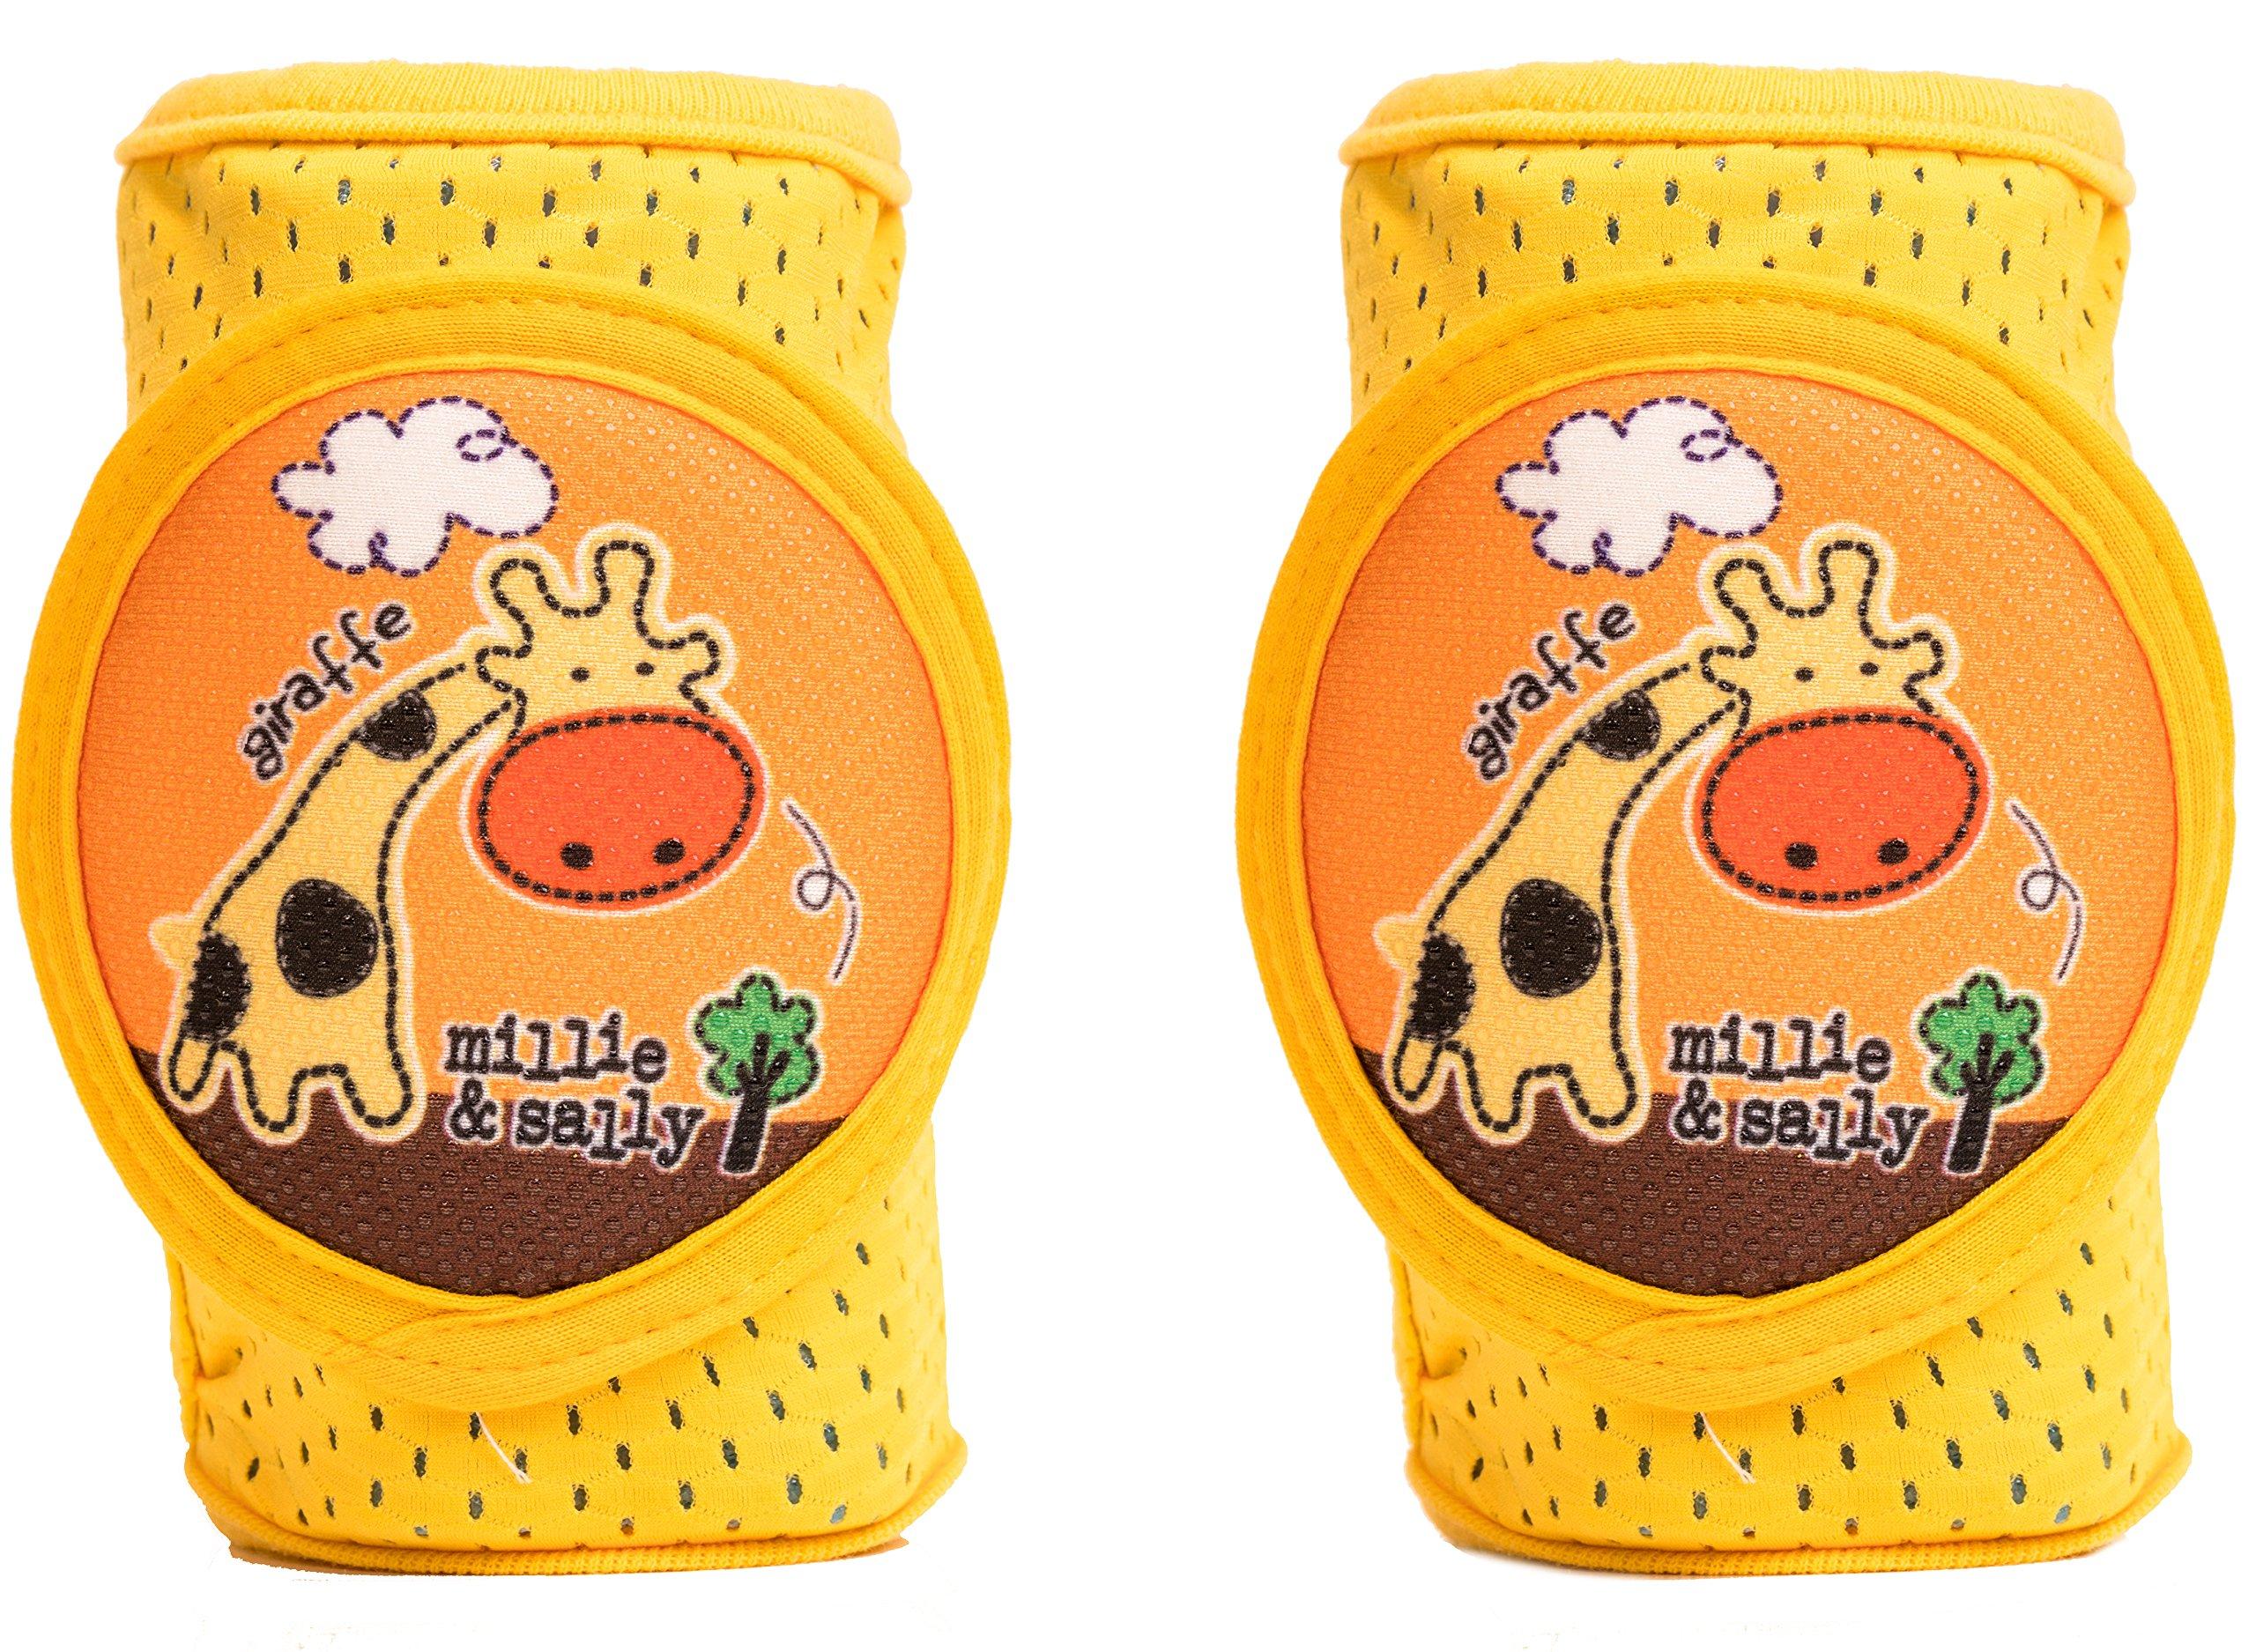 Baby Knee Pads Anti-Slip Walking Kneepads Adjustable Hook & Loop Strap Unisex For Boys Girls Infant Toddler Knee & Elbow Pads Memory Foam Pad Cushion Breathable Mesh Fabric Knee Pads For Babies by Kstar (Image #4)